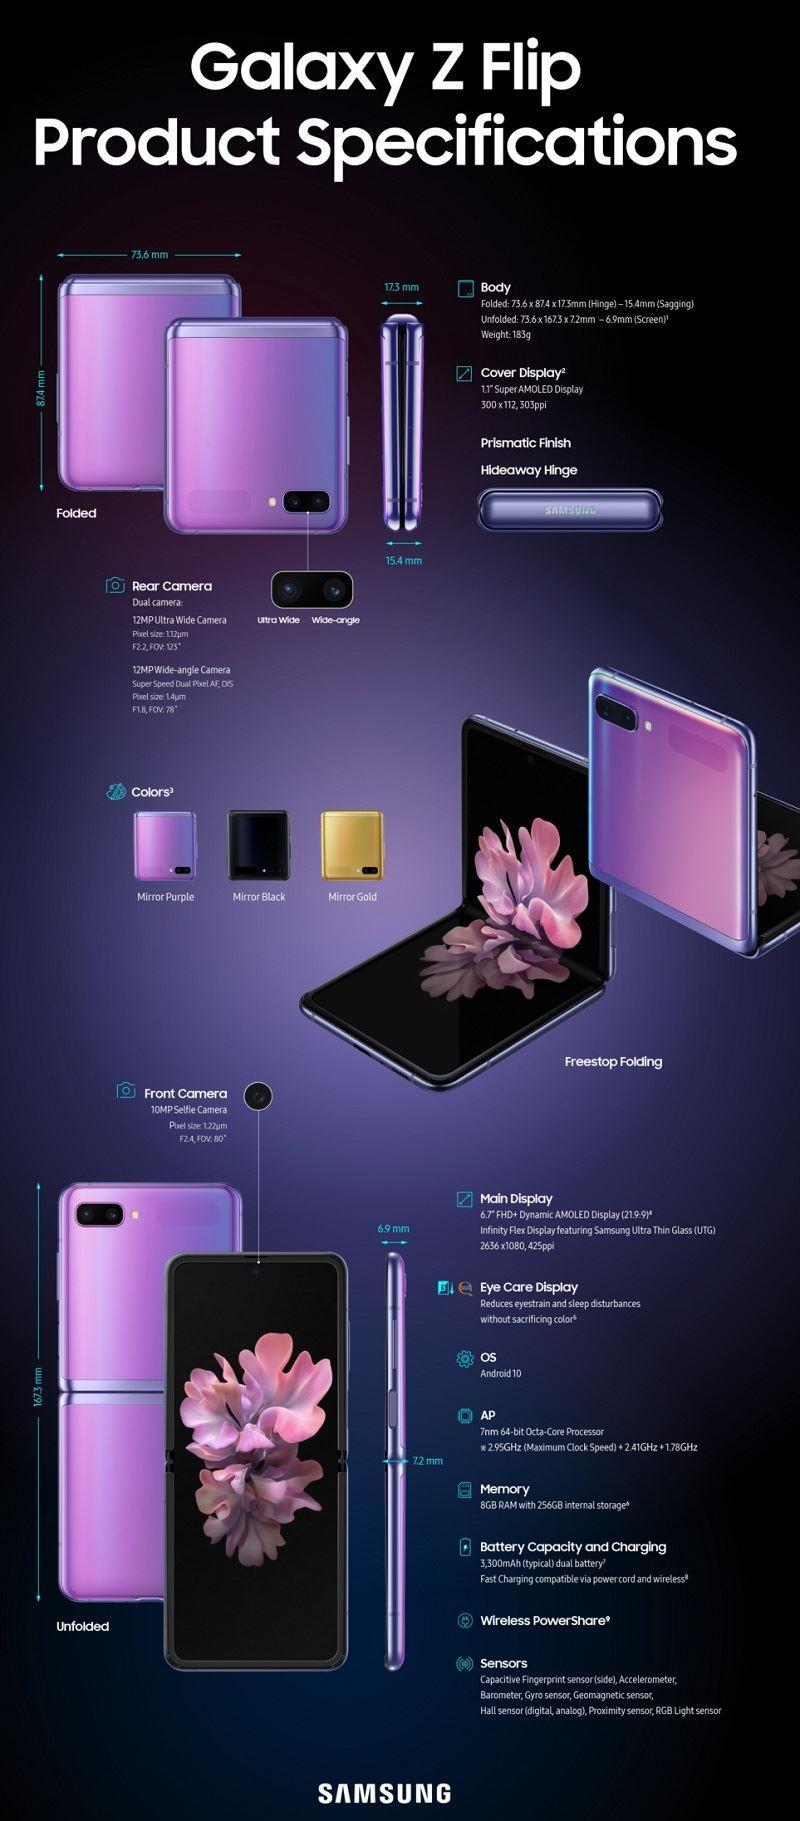 Techferal Motorola Razr Vs Samsung Galaxy Z Flip Which Is Better In 2020 Motorola Razr Samsung Wallpaper Samsung Galaxy Phones